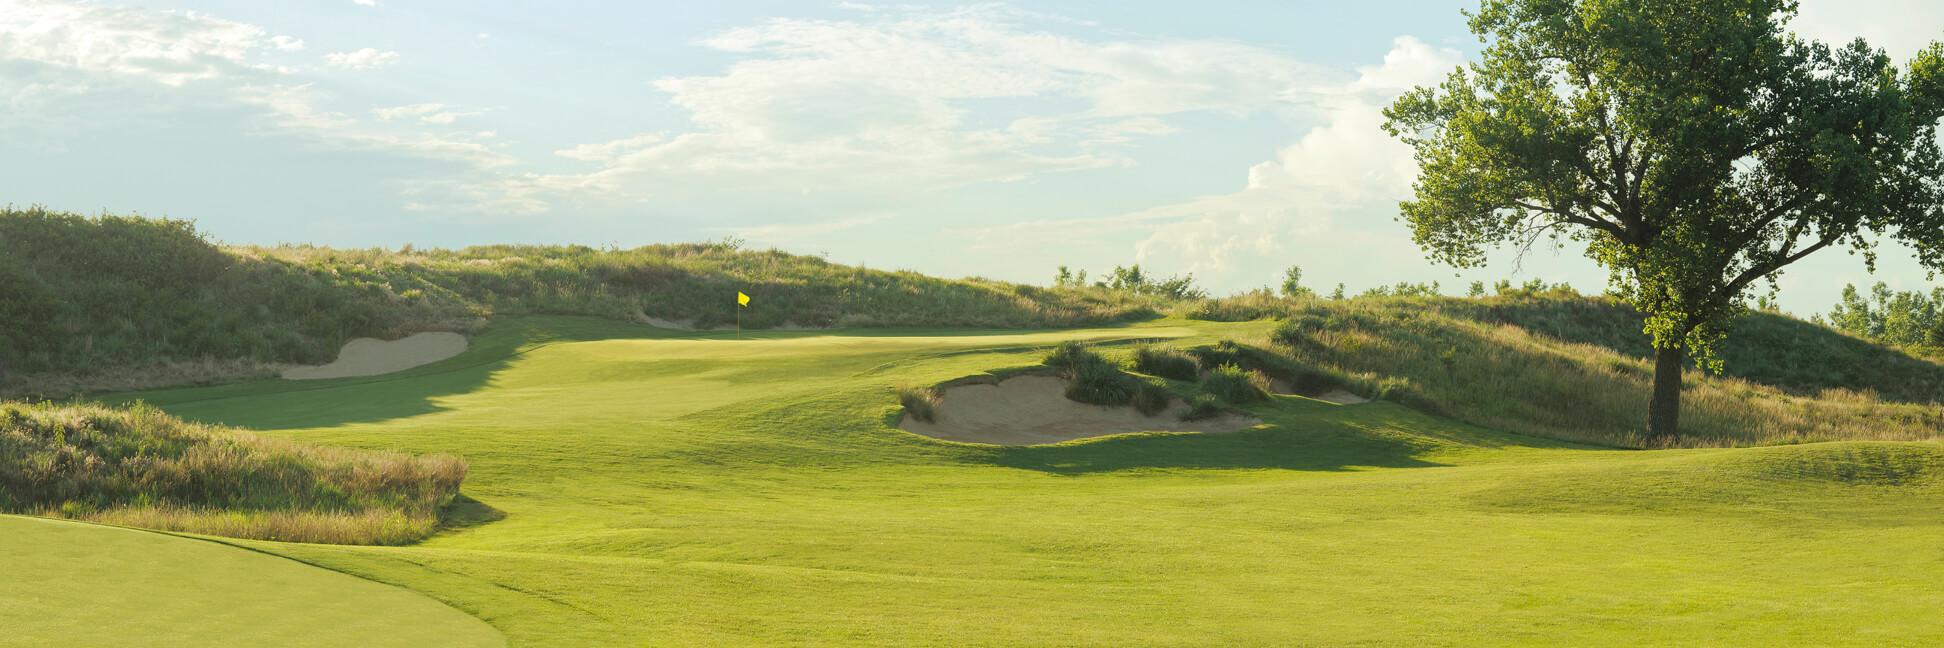 Golf Course Image - Prairie Dunes Country Club No. 4